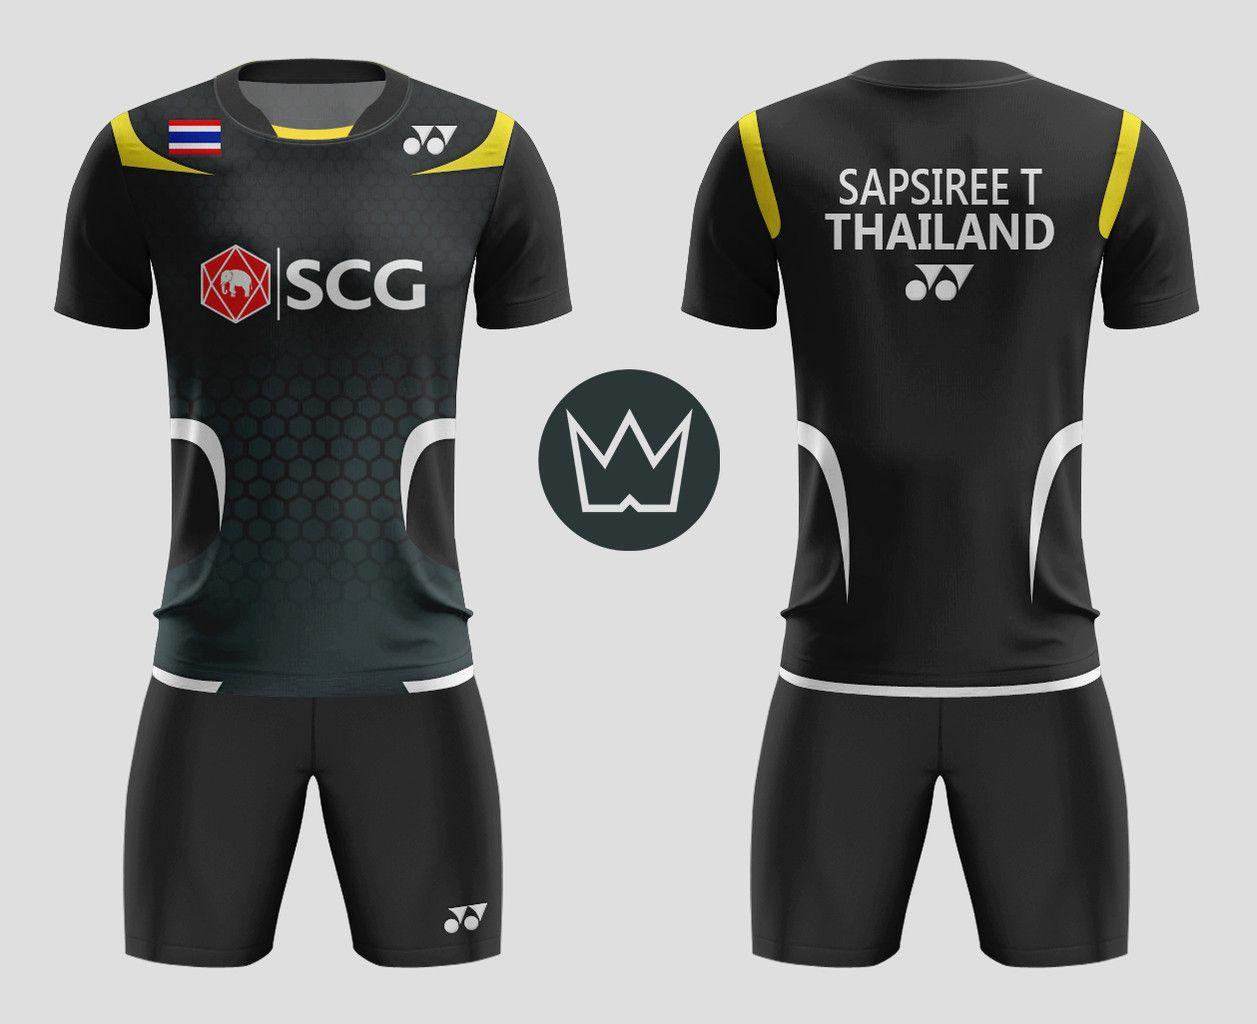 Jasa Desain Jersey Football Futsal Sepak Bola Kaskus